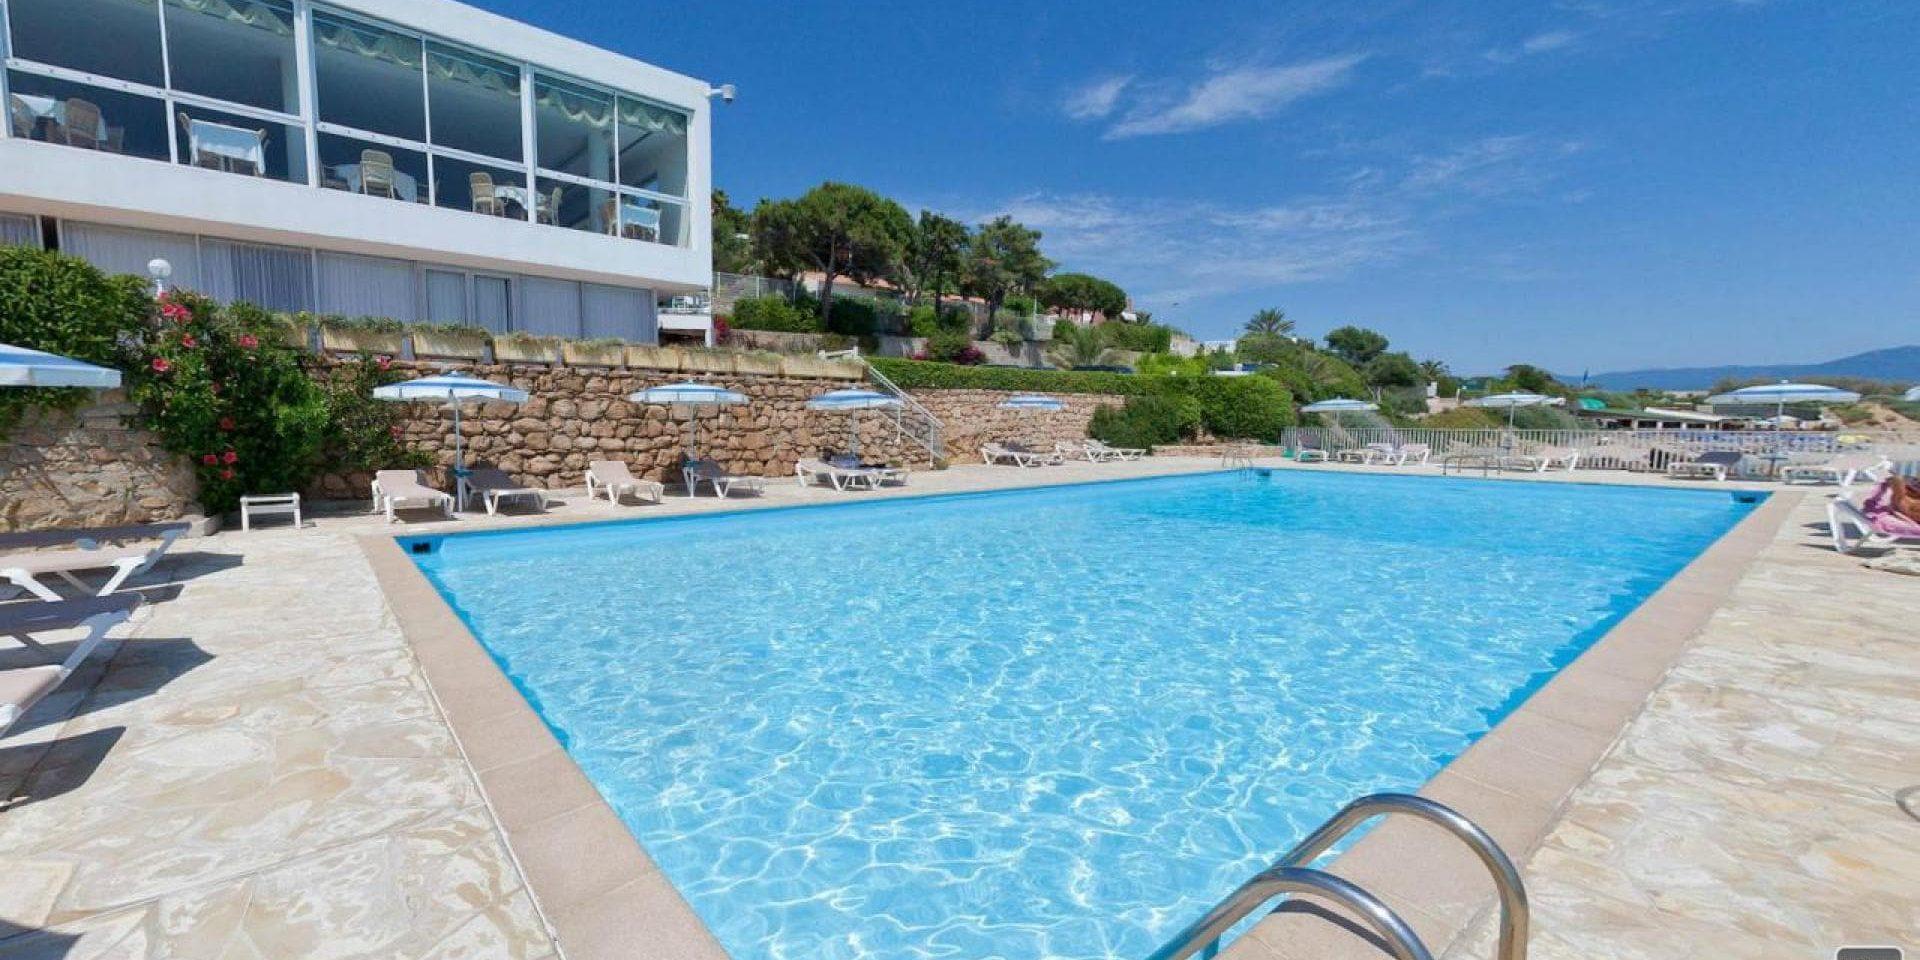 Hotel Cala di Sole Ajaccio Corsica Frankrijk zwembad ligbedden parasols